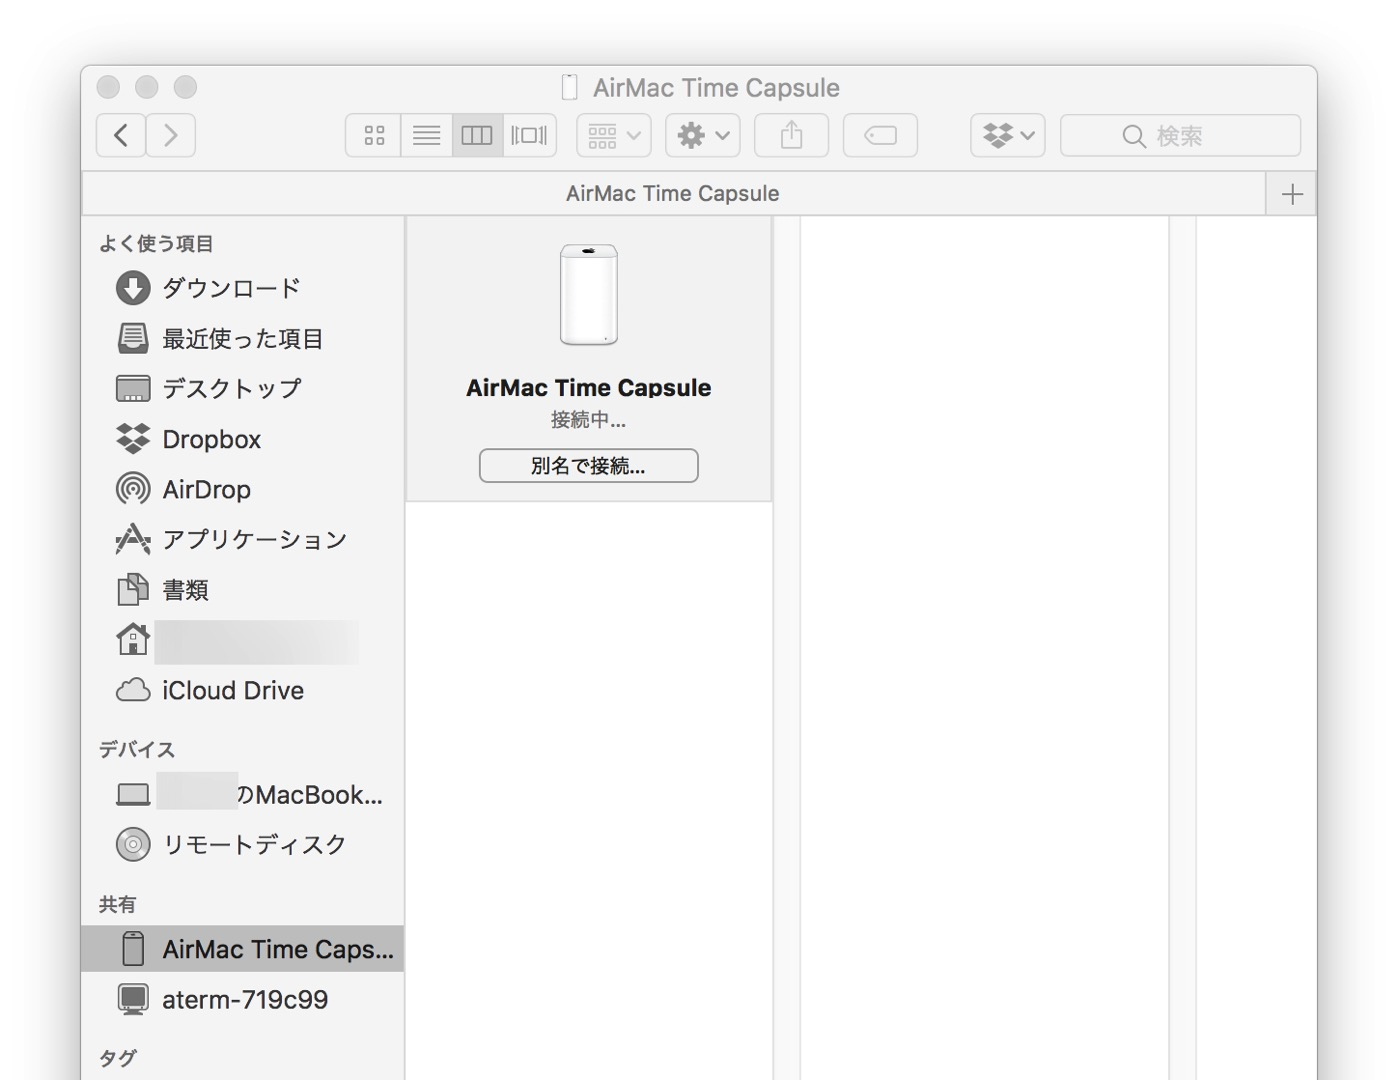 AirMac Time Capsule−5